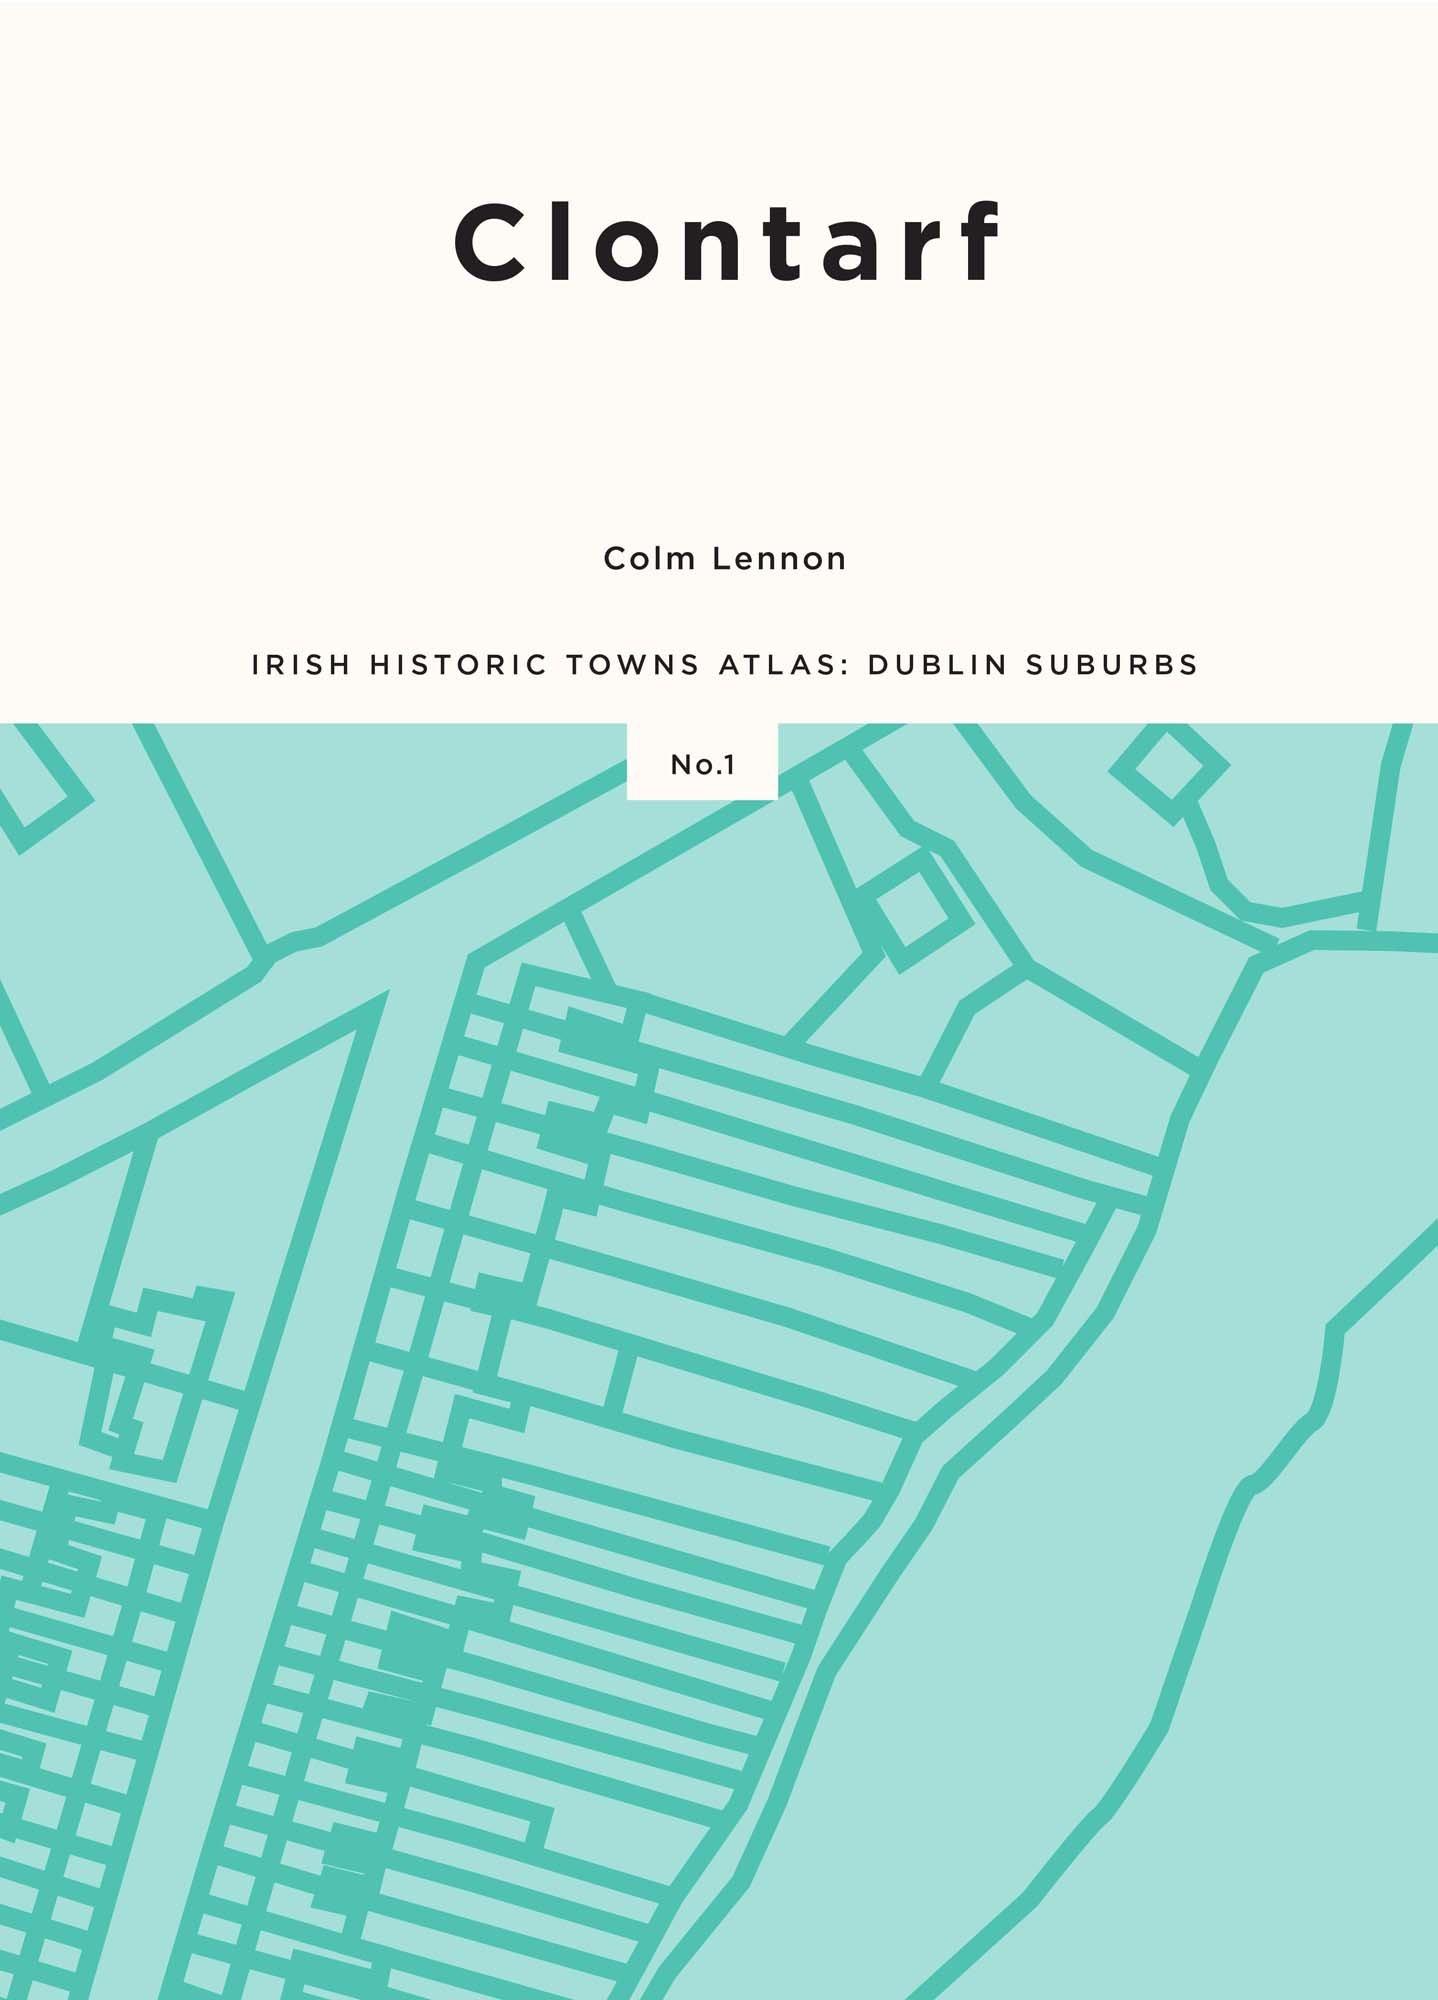 Clontarf (Irish Historic Towns Atlas: Dublin Suburbs)